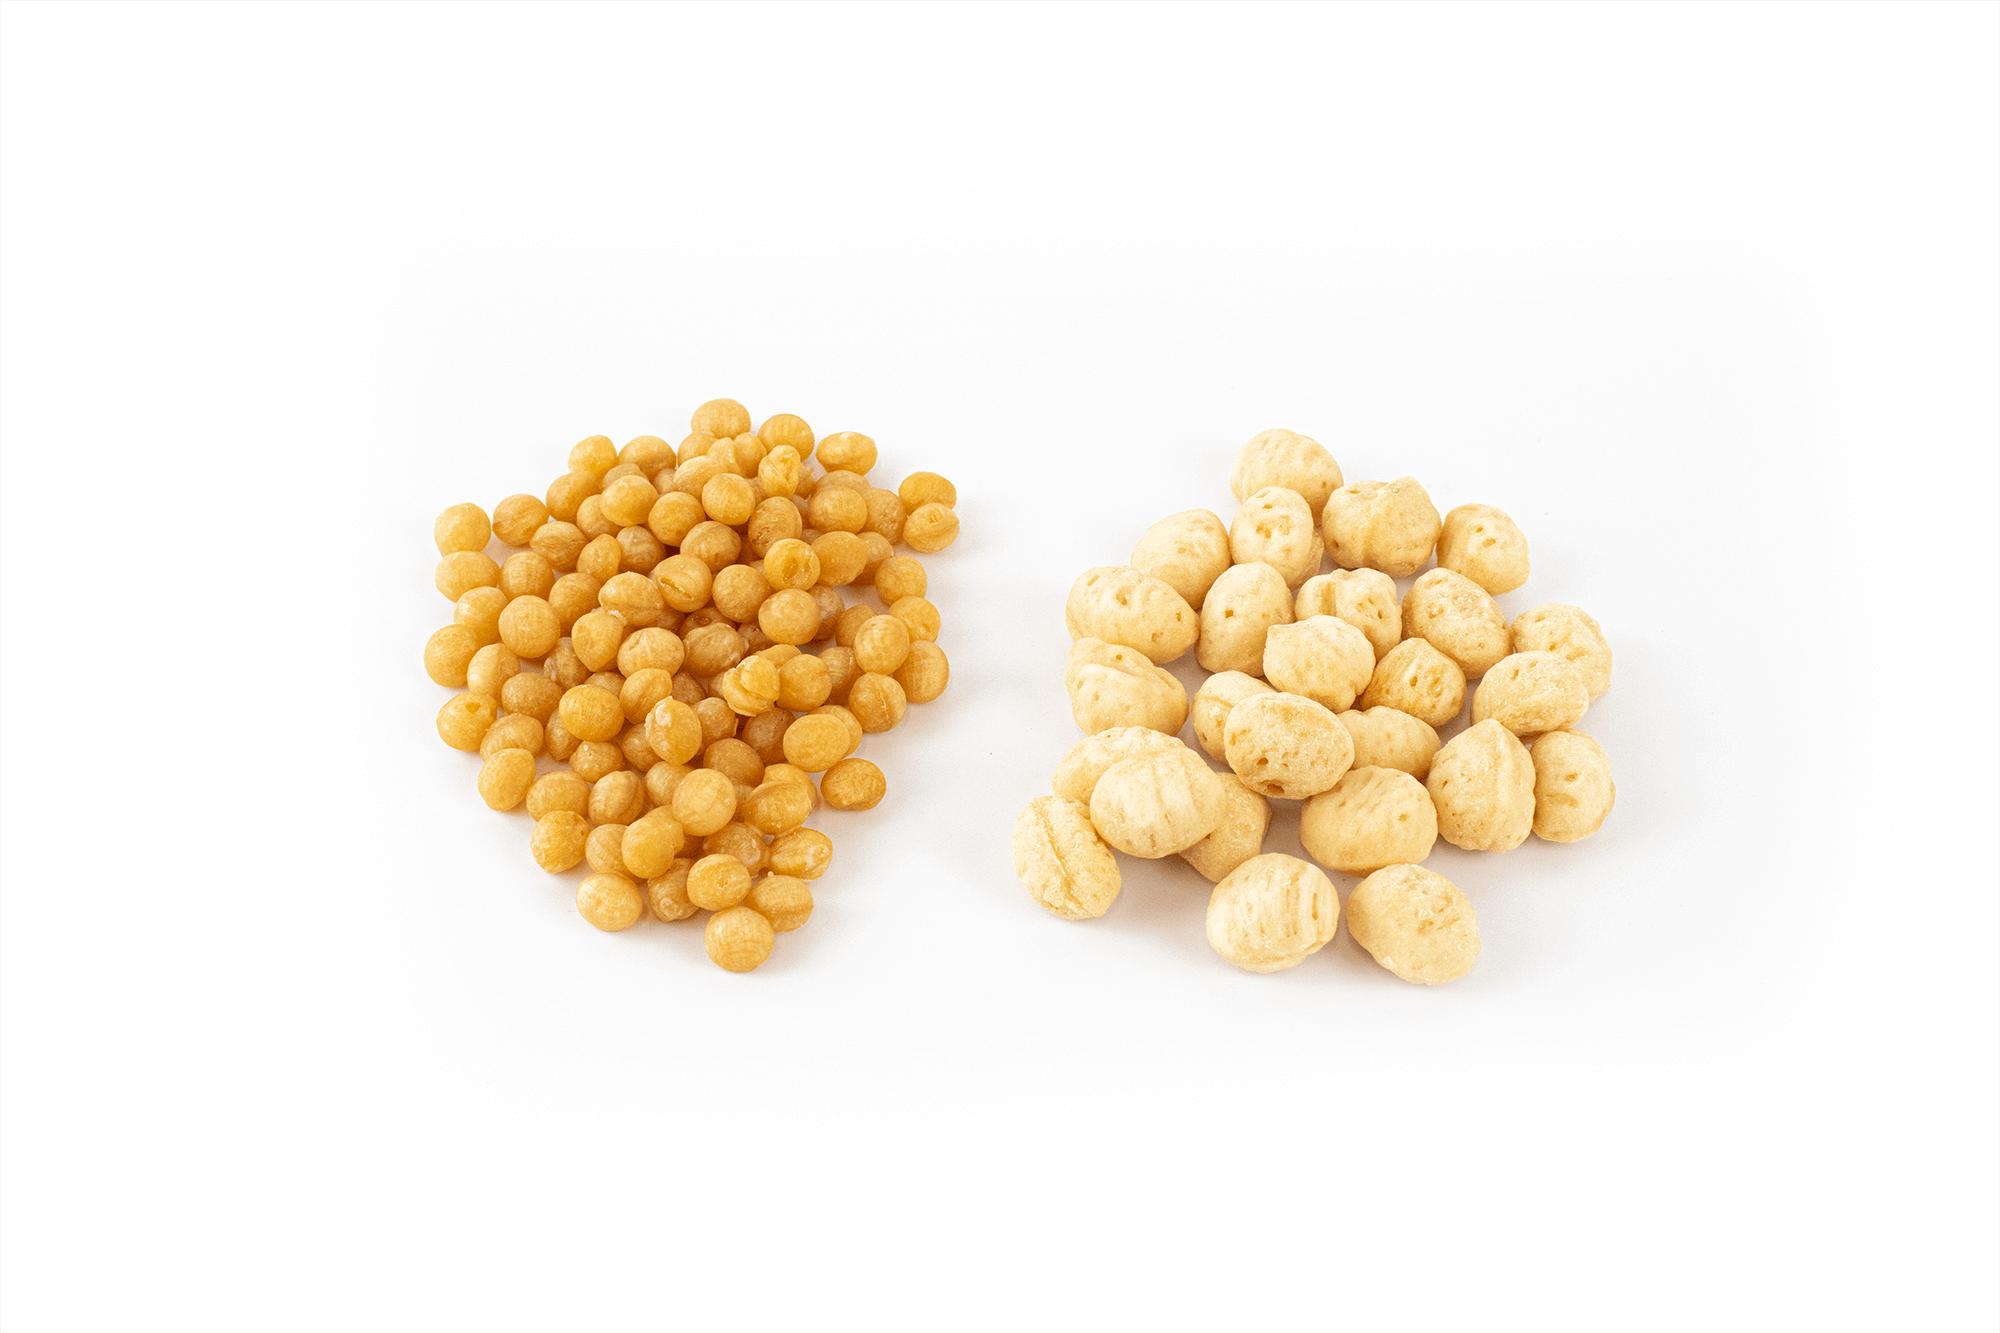 brittle vs fluffy honeycomb